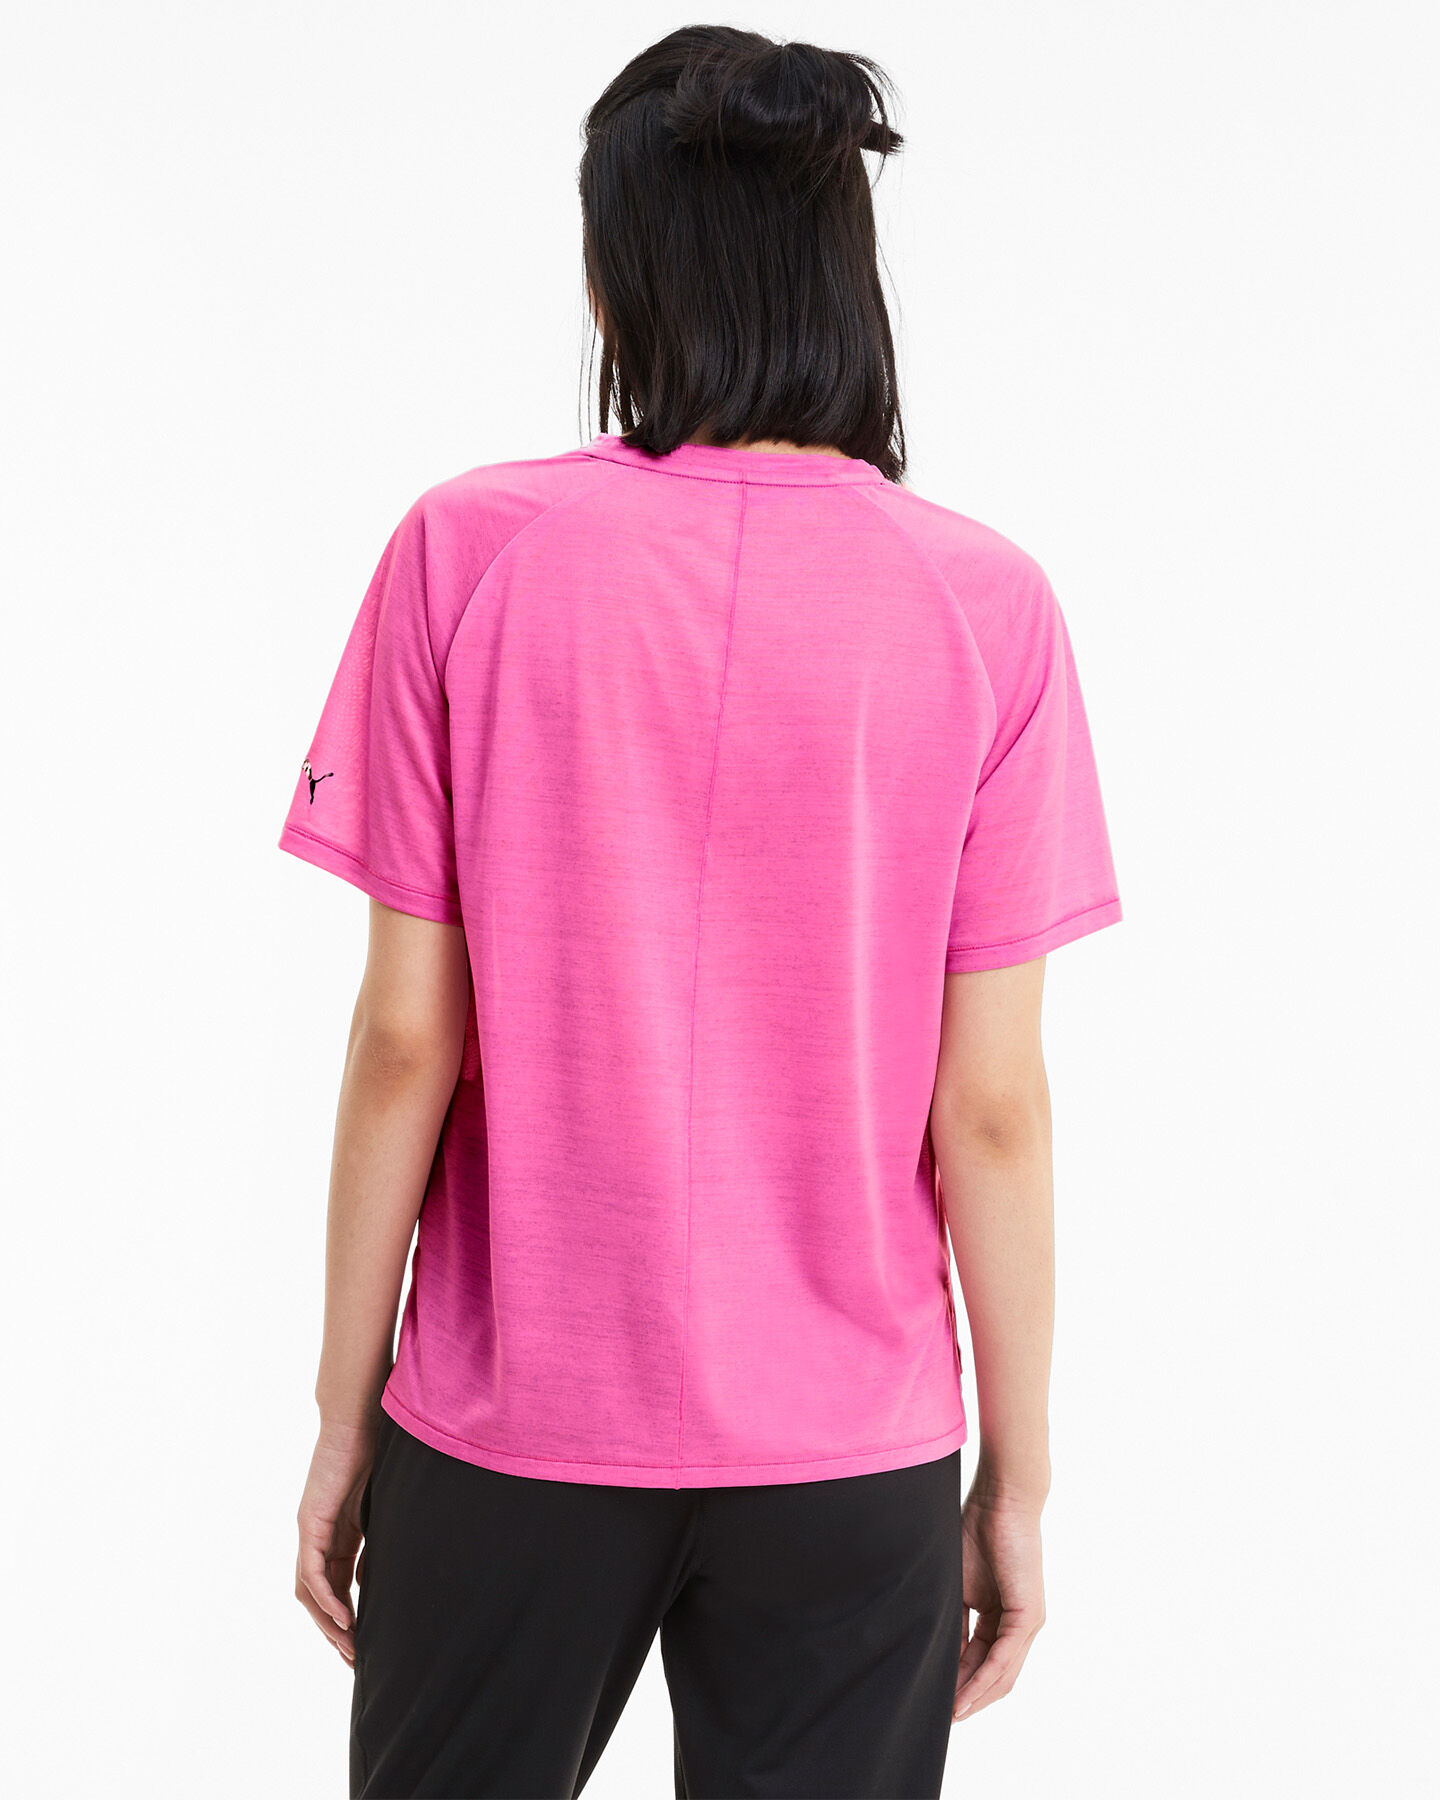 T-Shirt training PUMA DRIFIT LOGO W S5234838 scatto 3